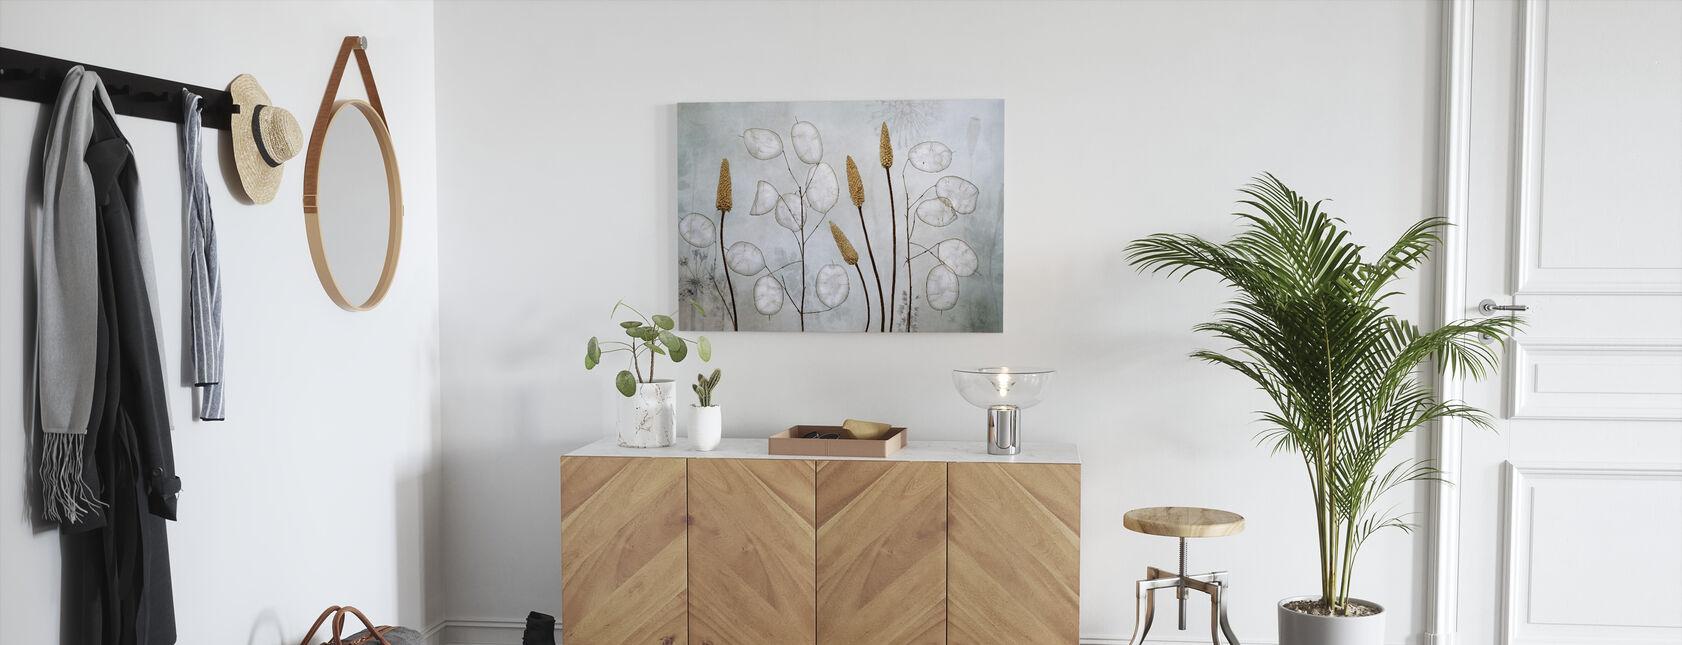 Lunaria - Canvastaulu - Aula